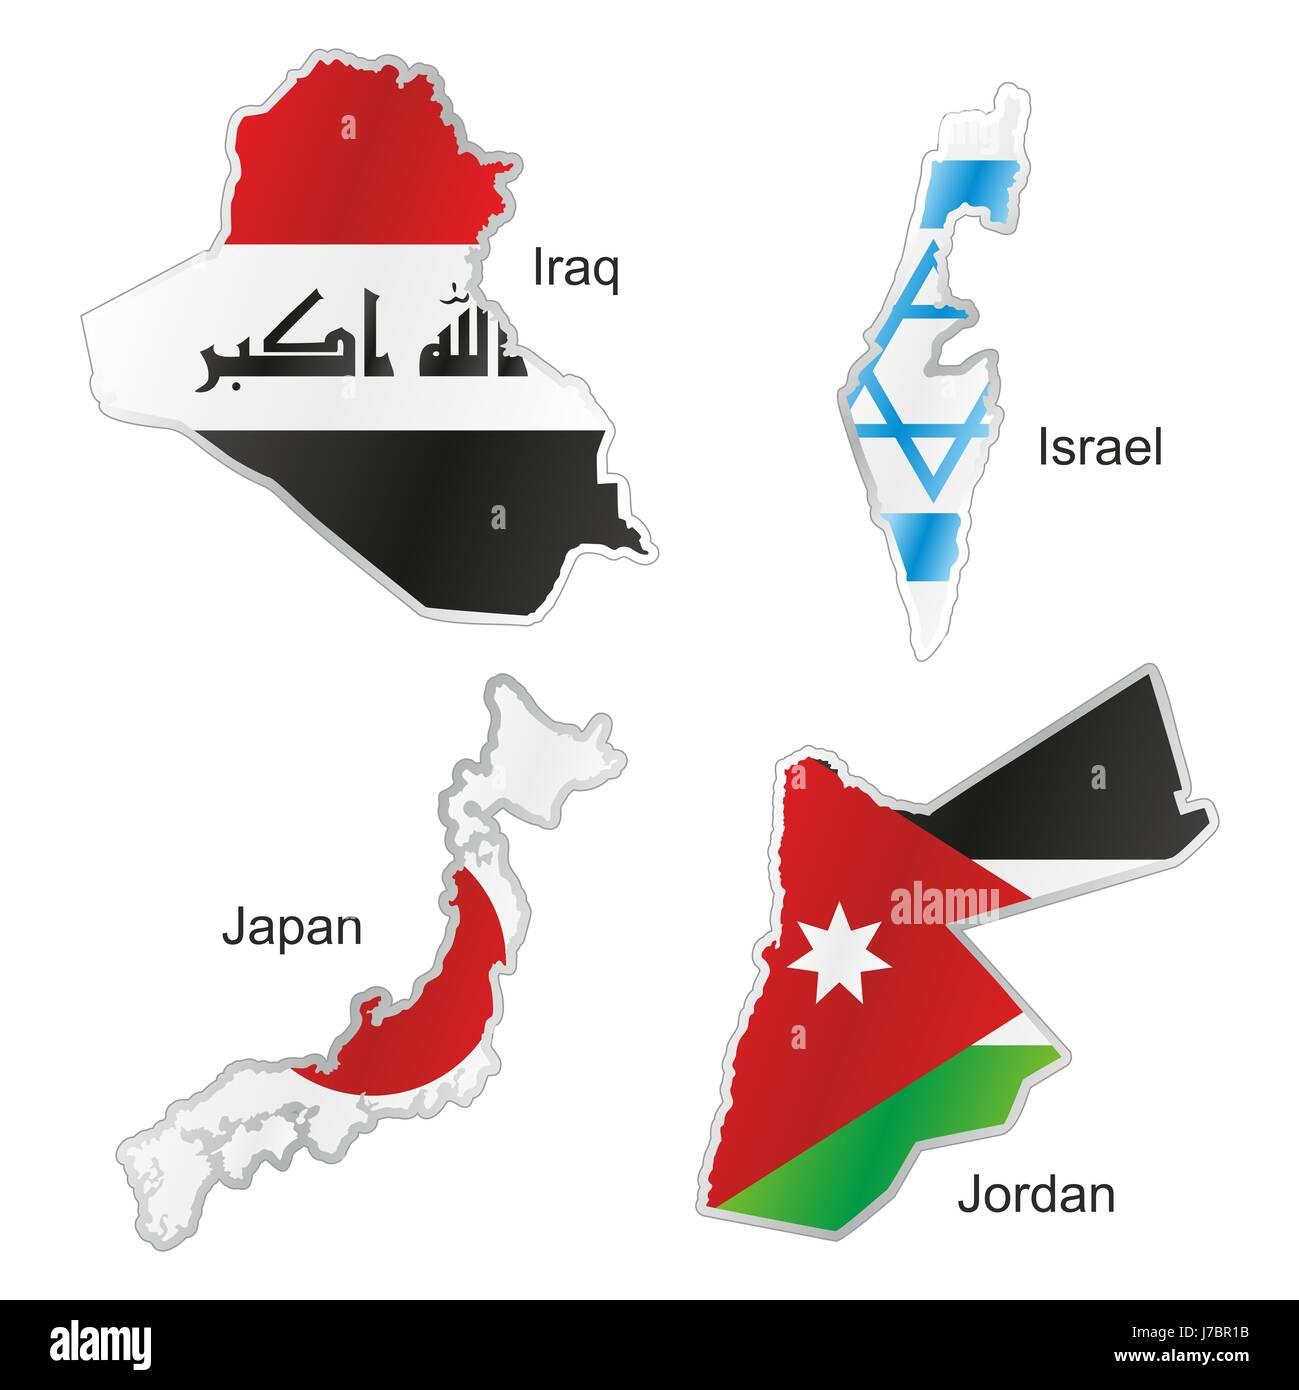 Asia jordan flag israel japan iraq map atlas map of the world stock asia jordan flag israel japan iraq map atlas map of the world isolated currency gumiabroncs Choice Image